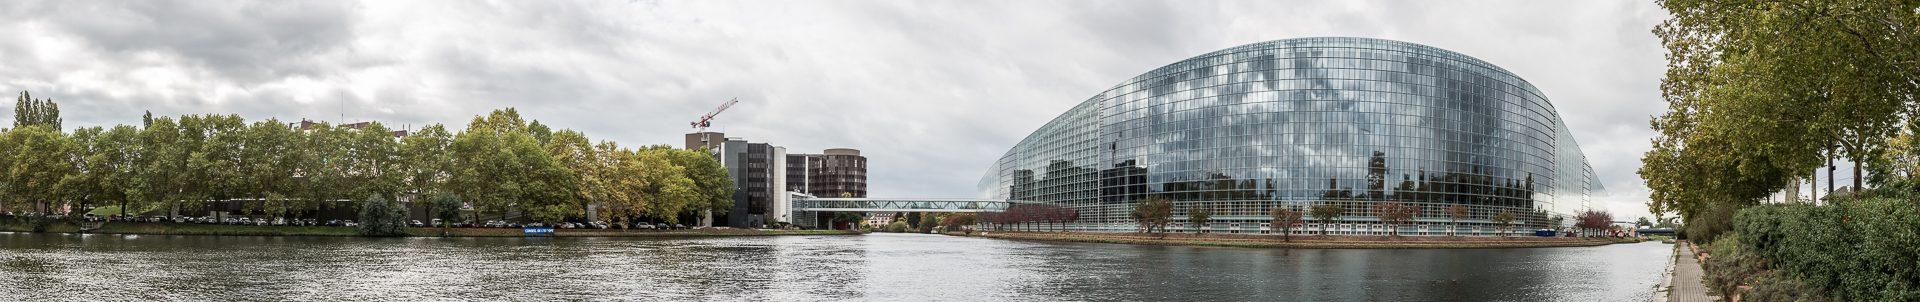 Straßburg Europaparlament